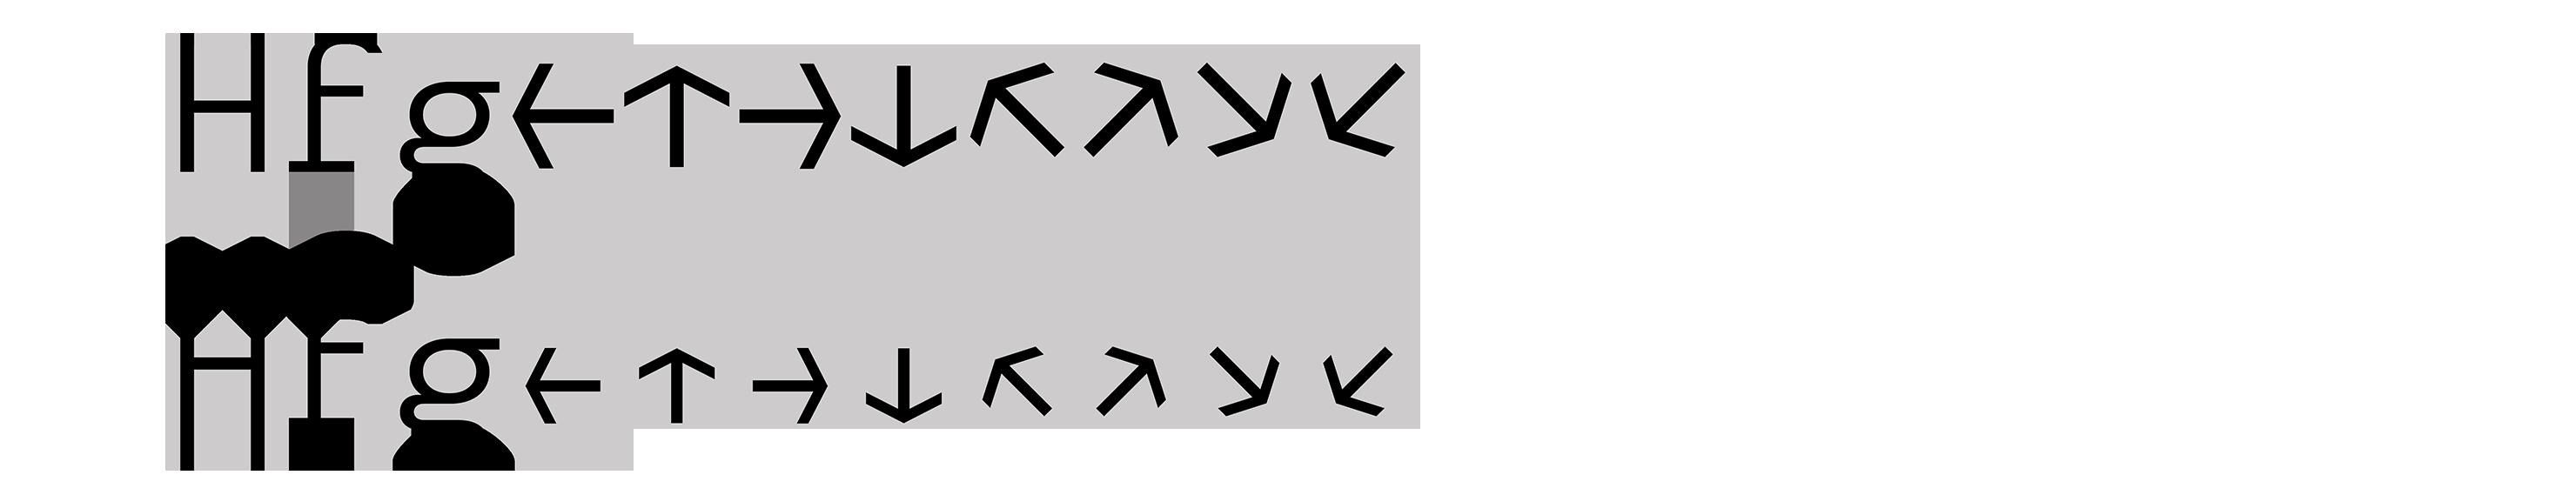 Typeface-Heimat-Mono-F15-Atlas-Font-Foundry